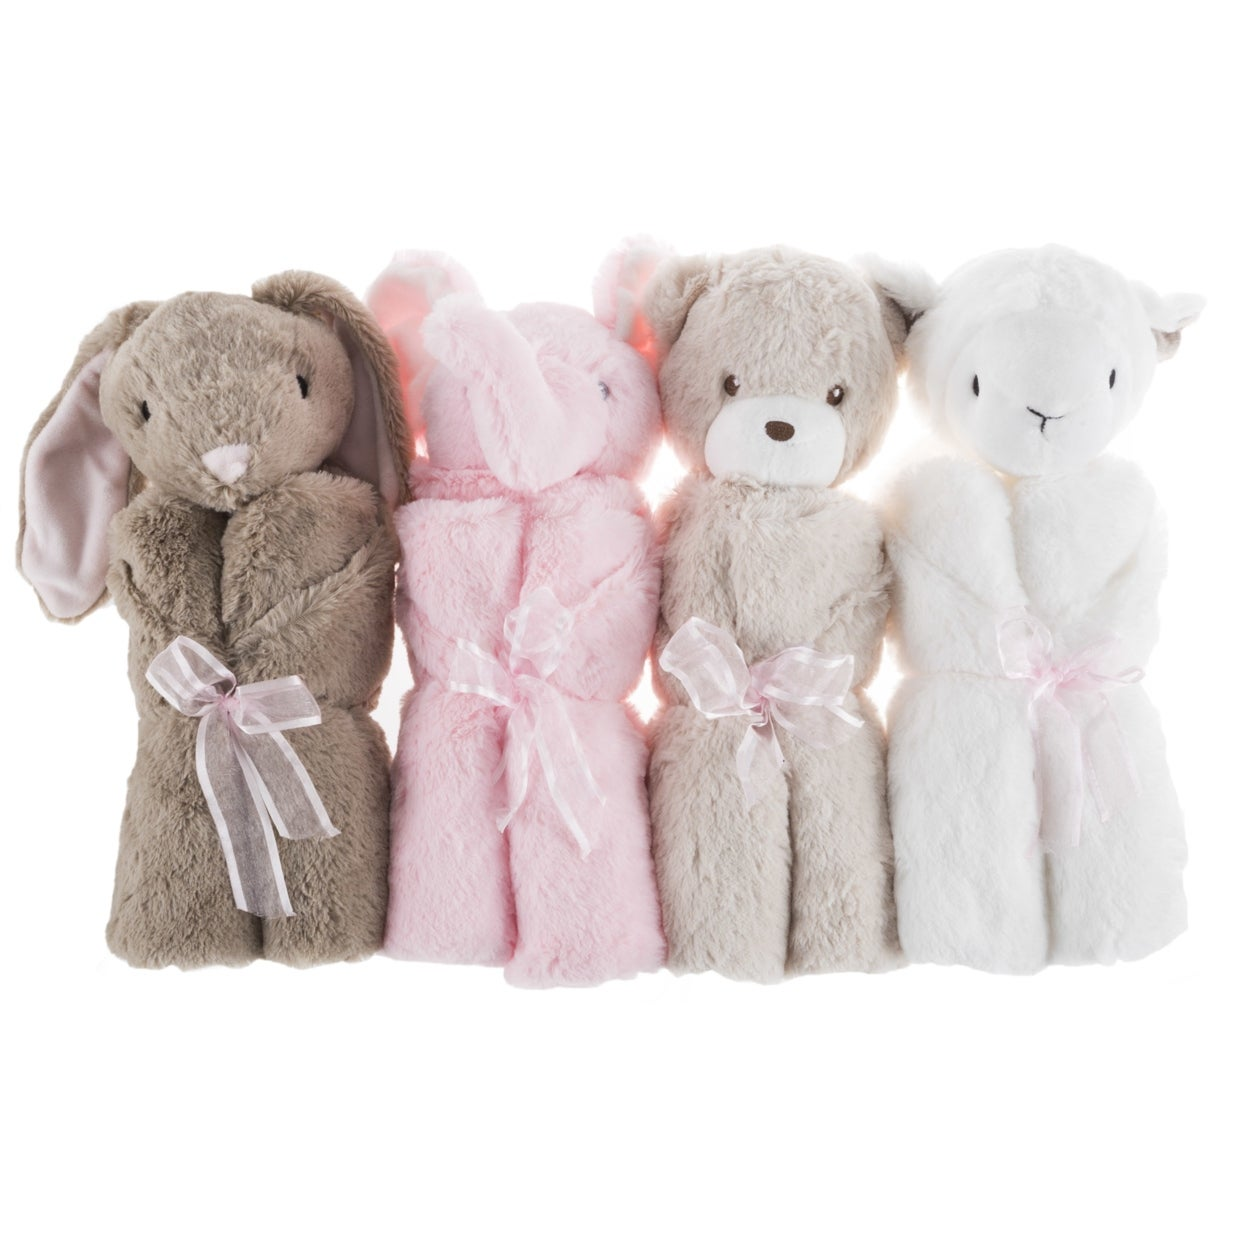 Brown Bunny Rabbit Baby Blanket And Stuffed Animal Toy